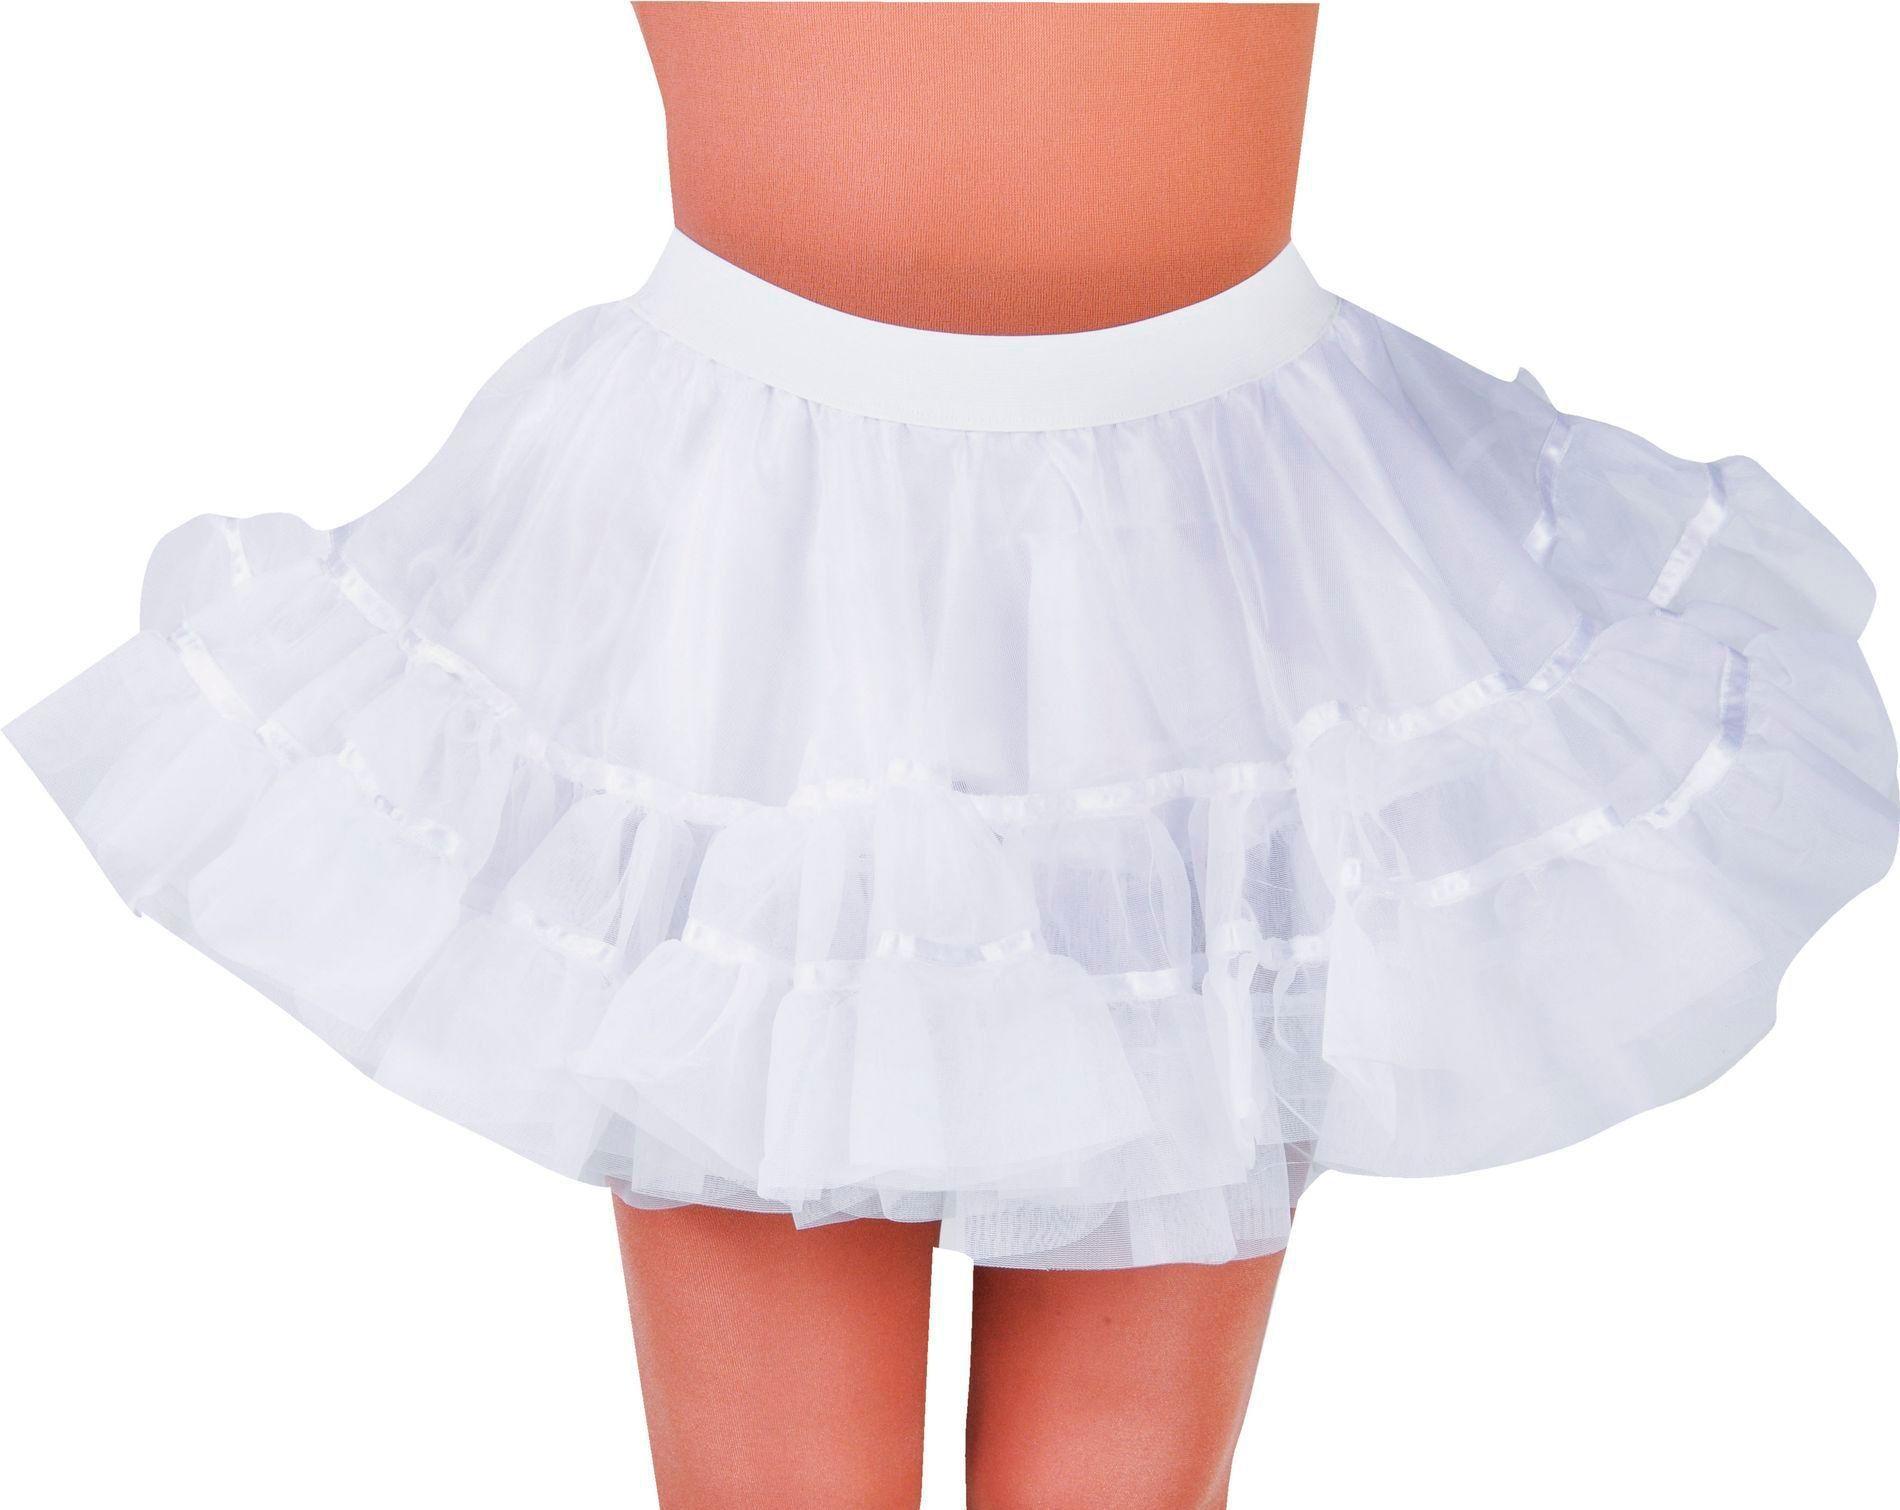 Petticoat wit dames kort